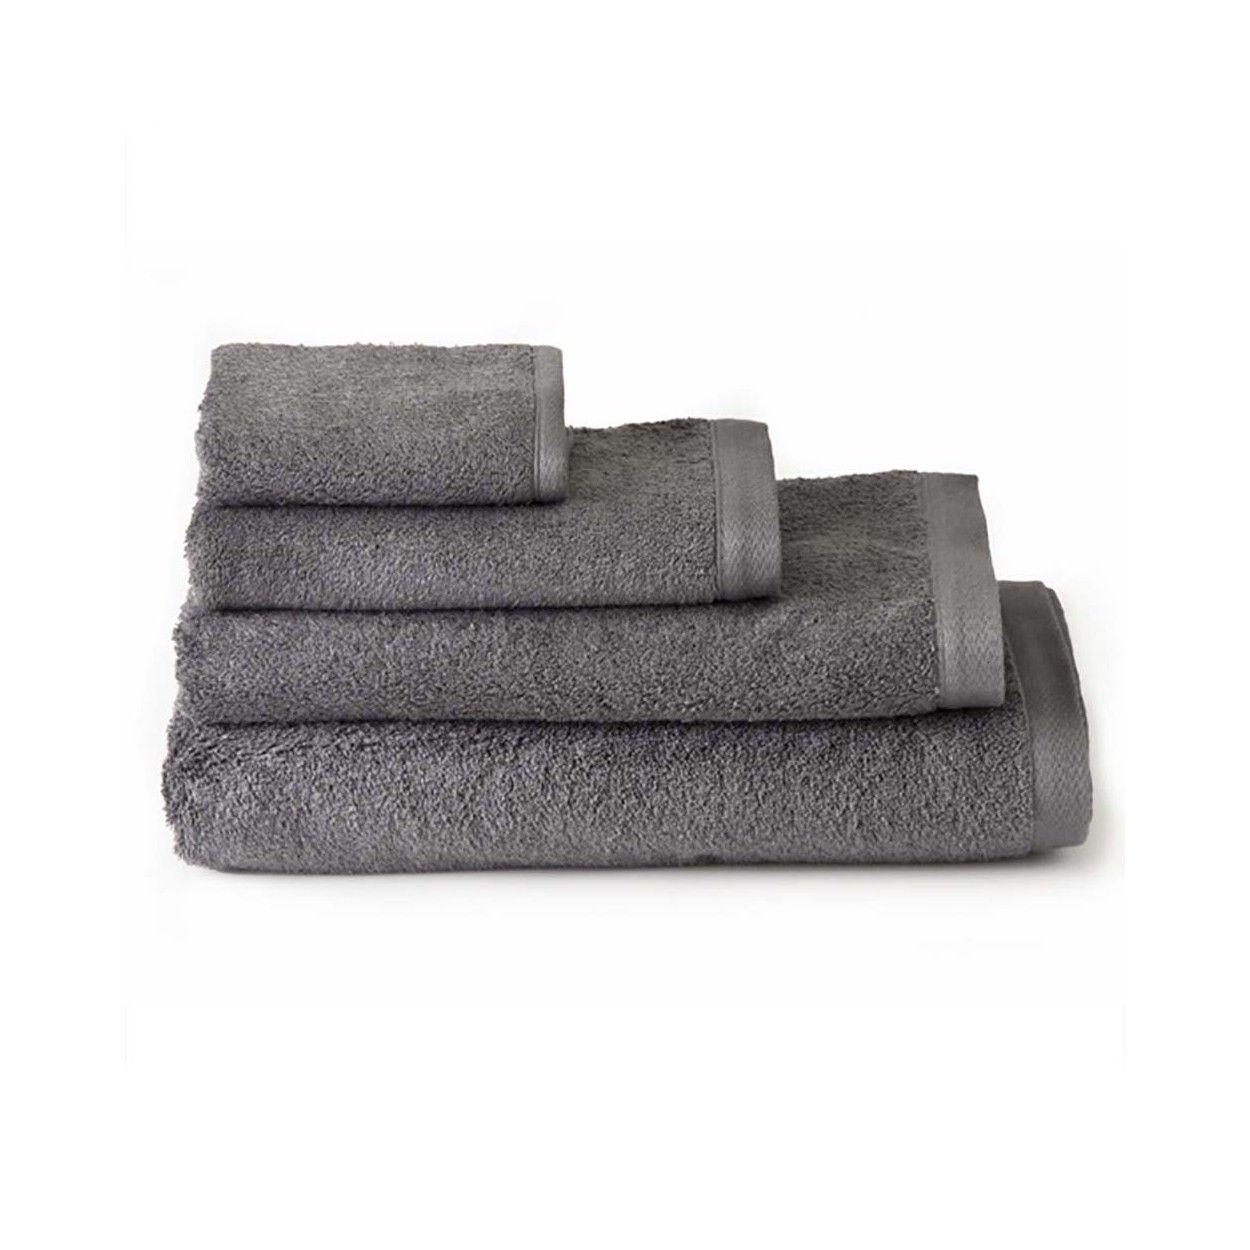 Toalla de ba o lavabo algod n gris hogar y m s - Toallas de algodon ...